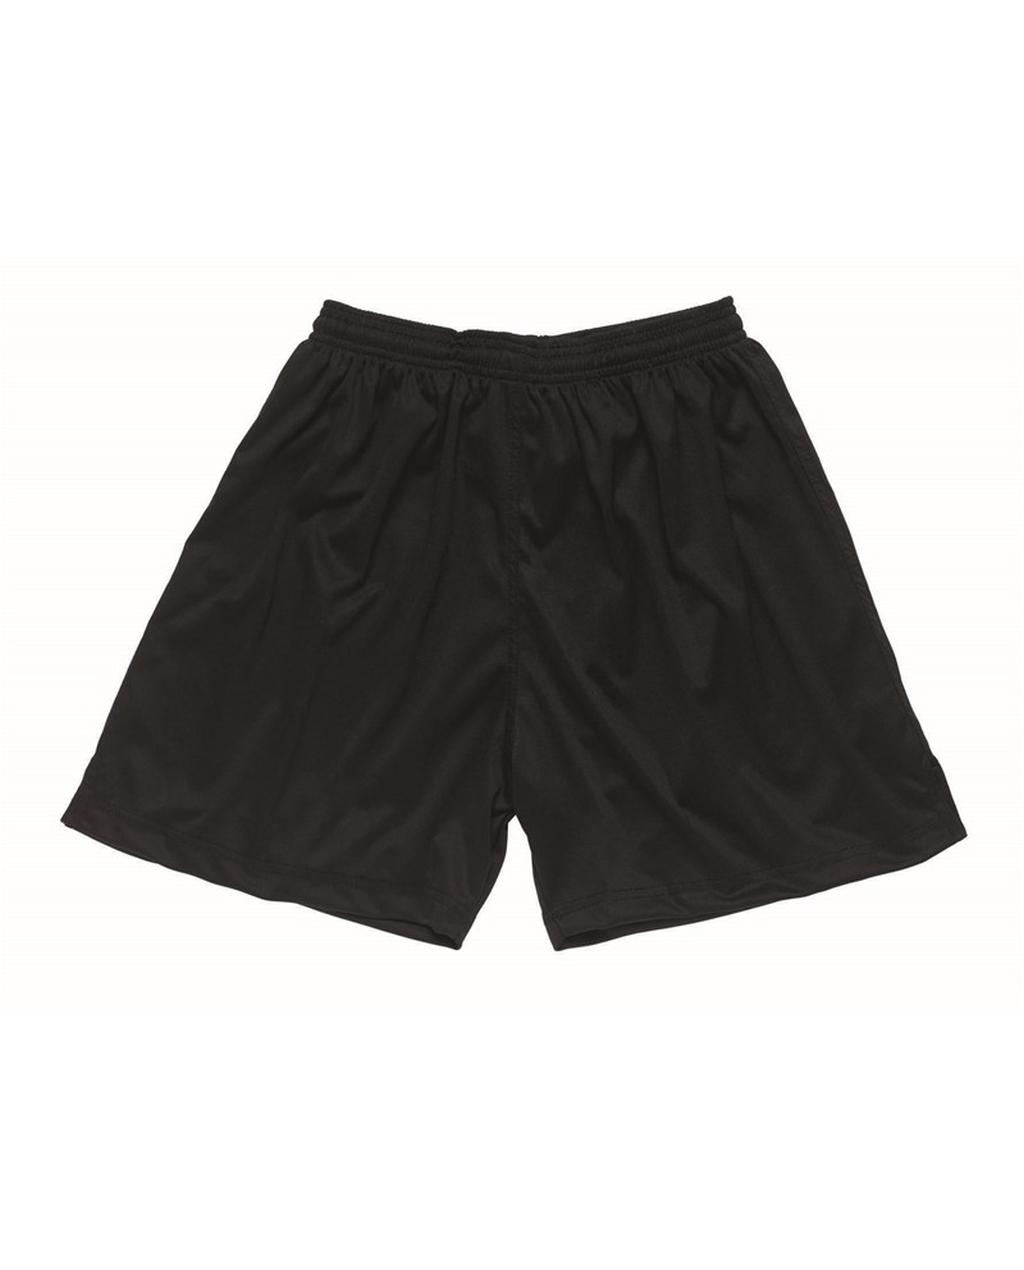 Sports Shorts - 28/30